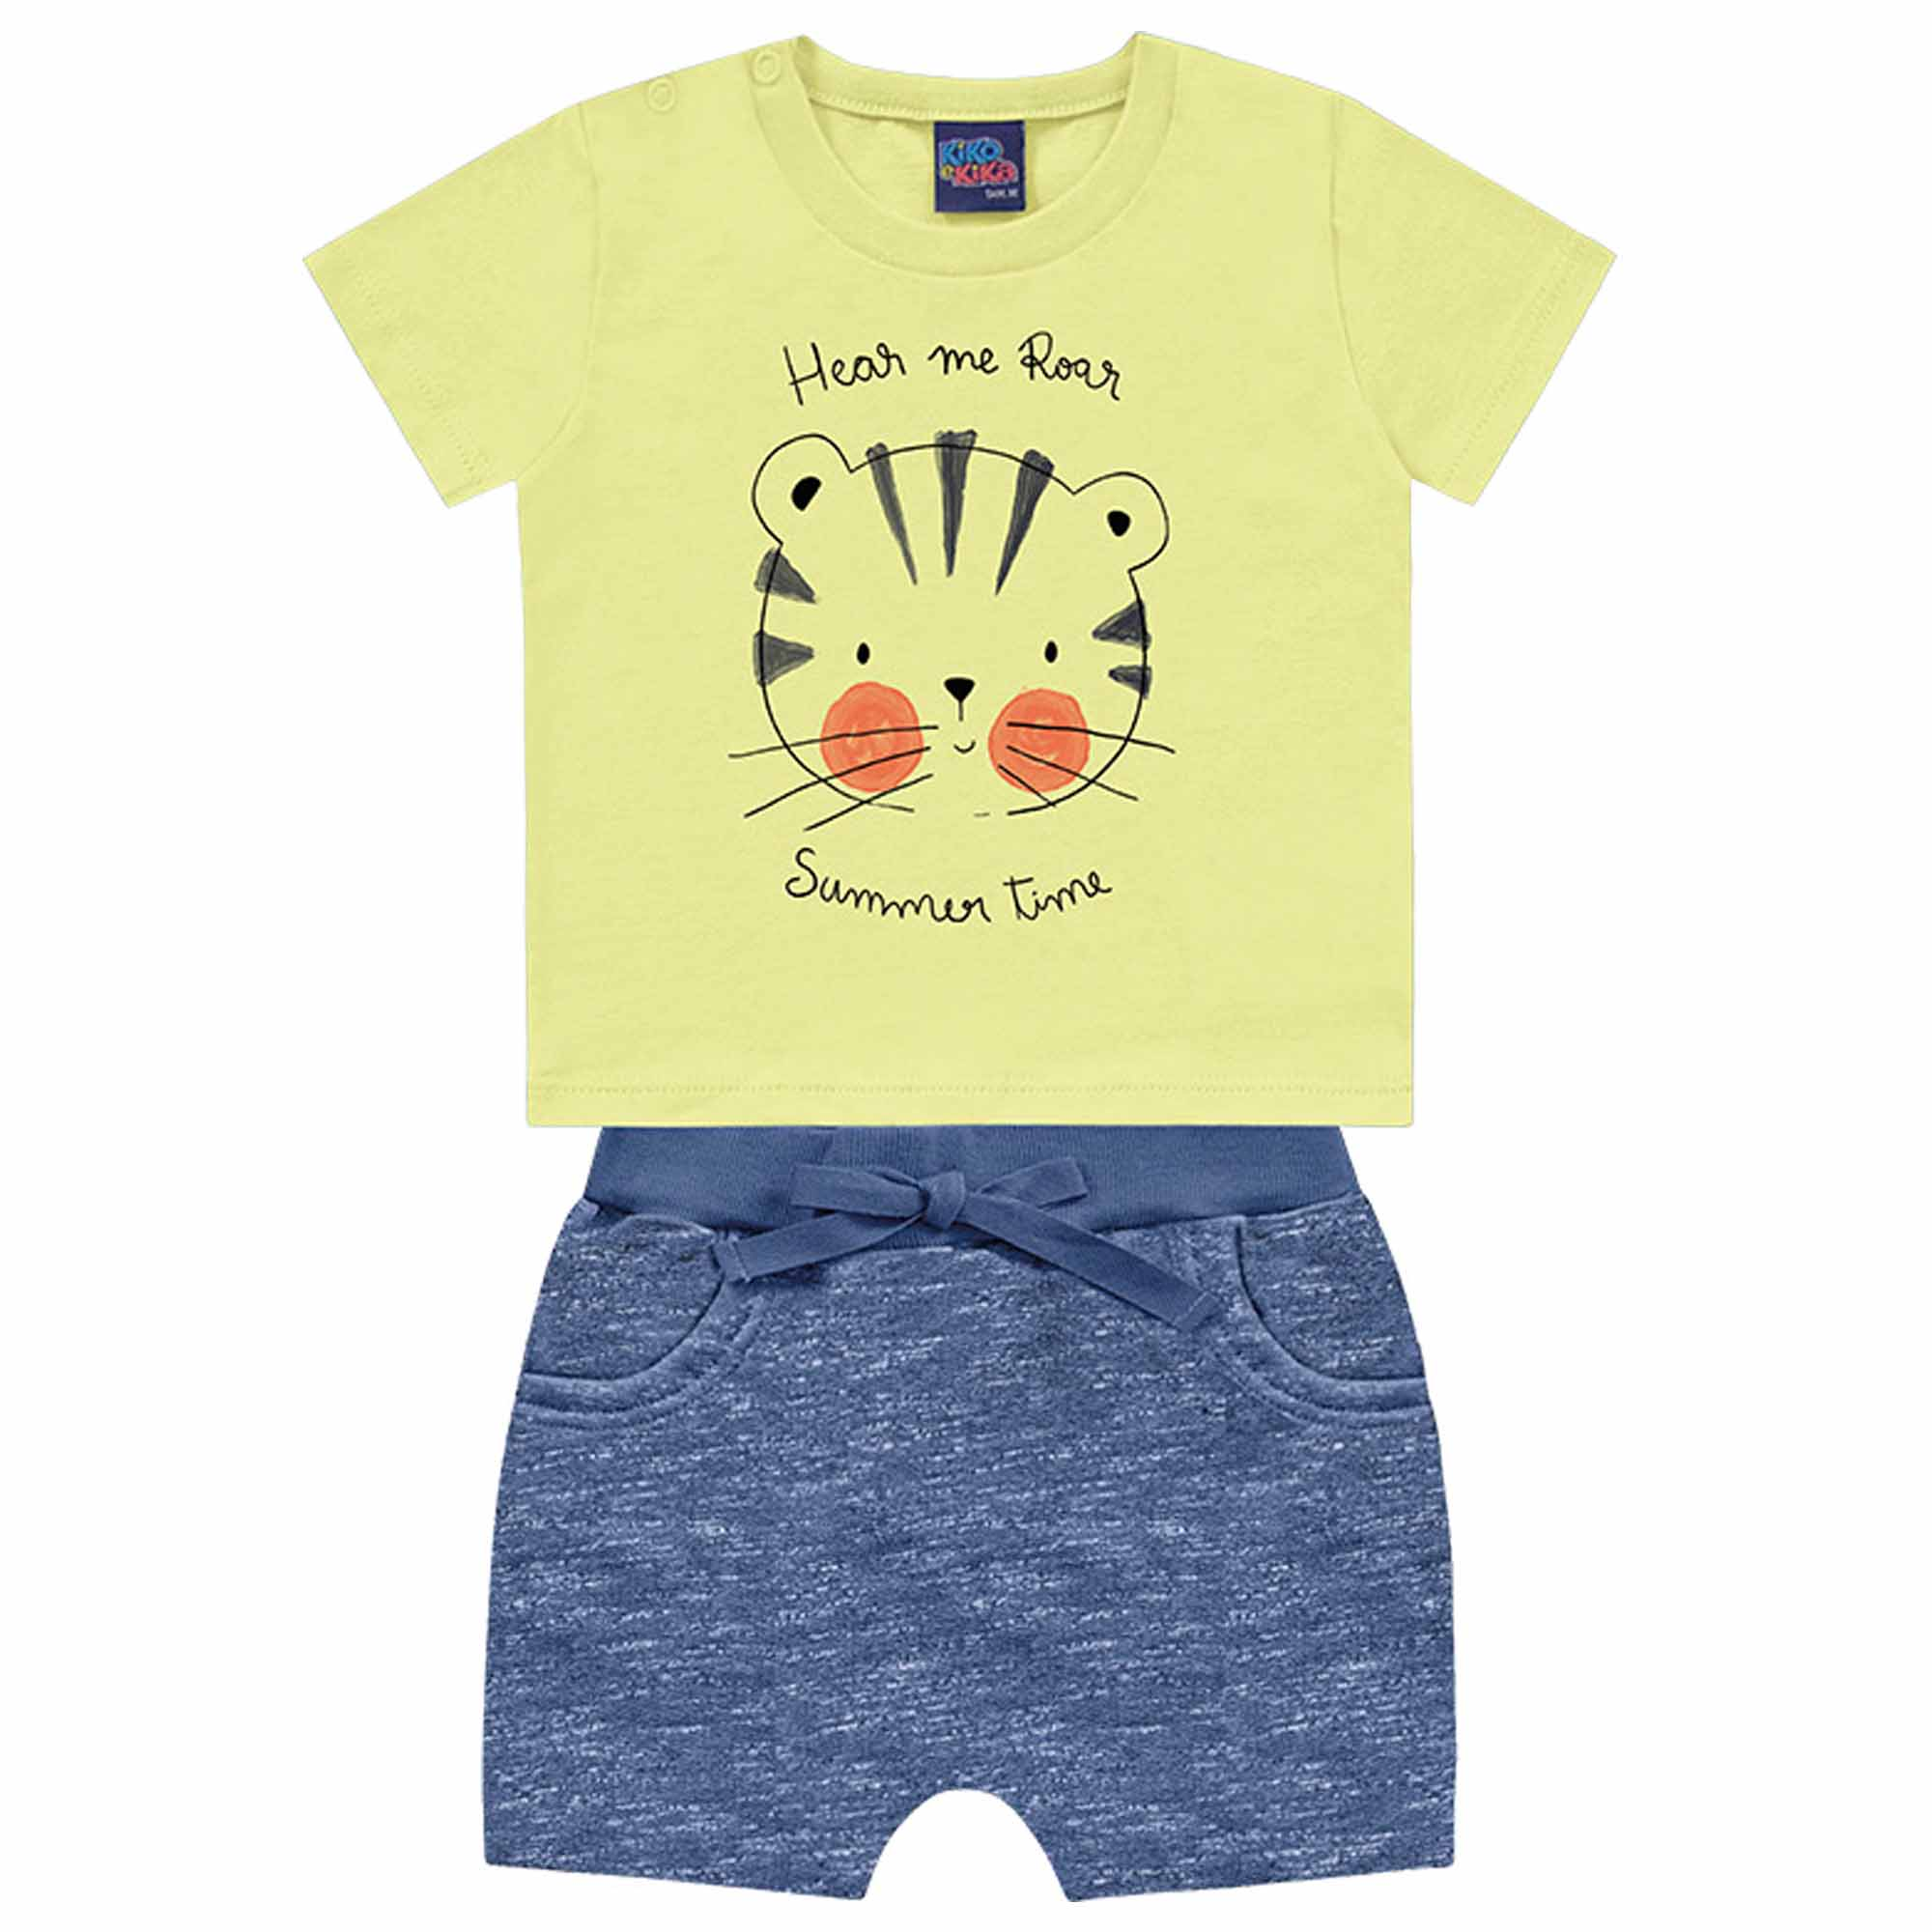 Conjunto Verão Kiko e Kika Camiseta e Bermuda - Tigre - P ao G